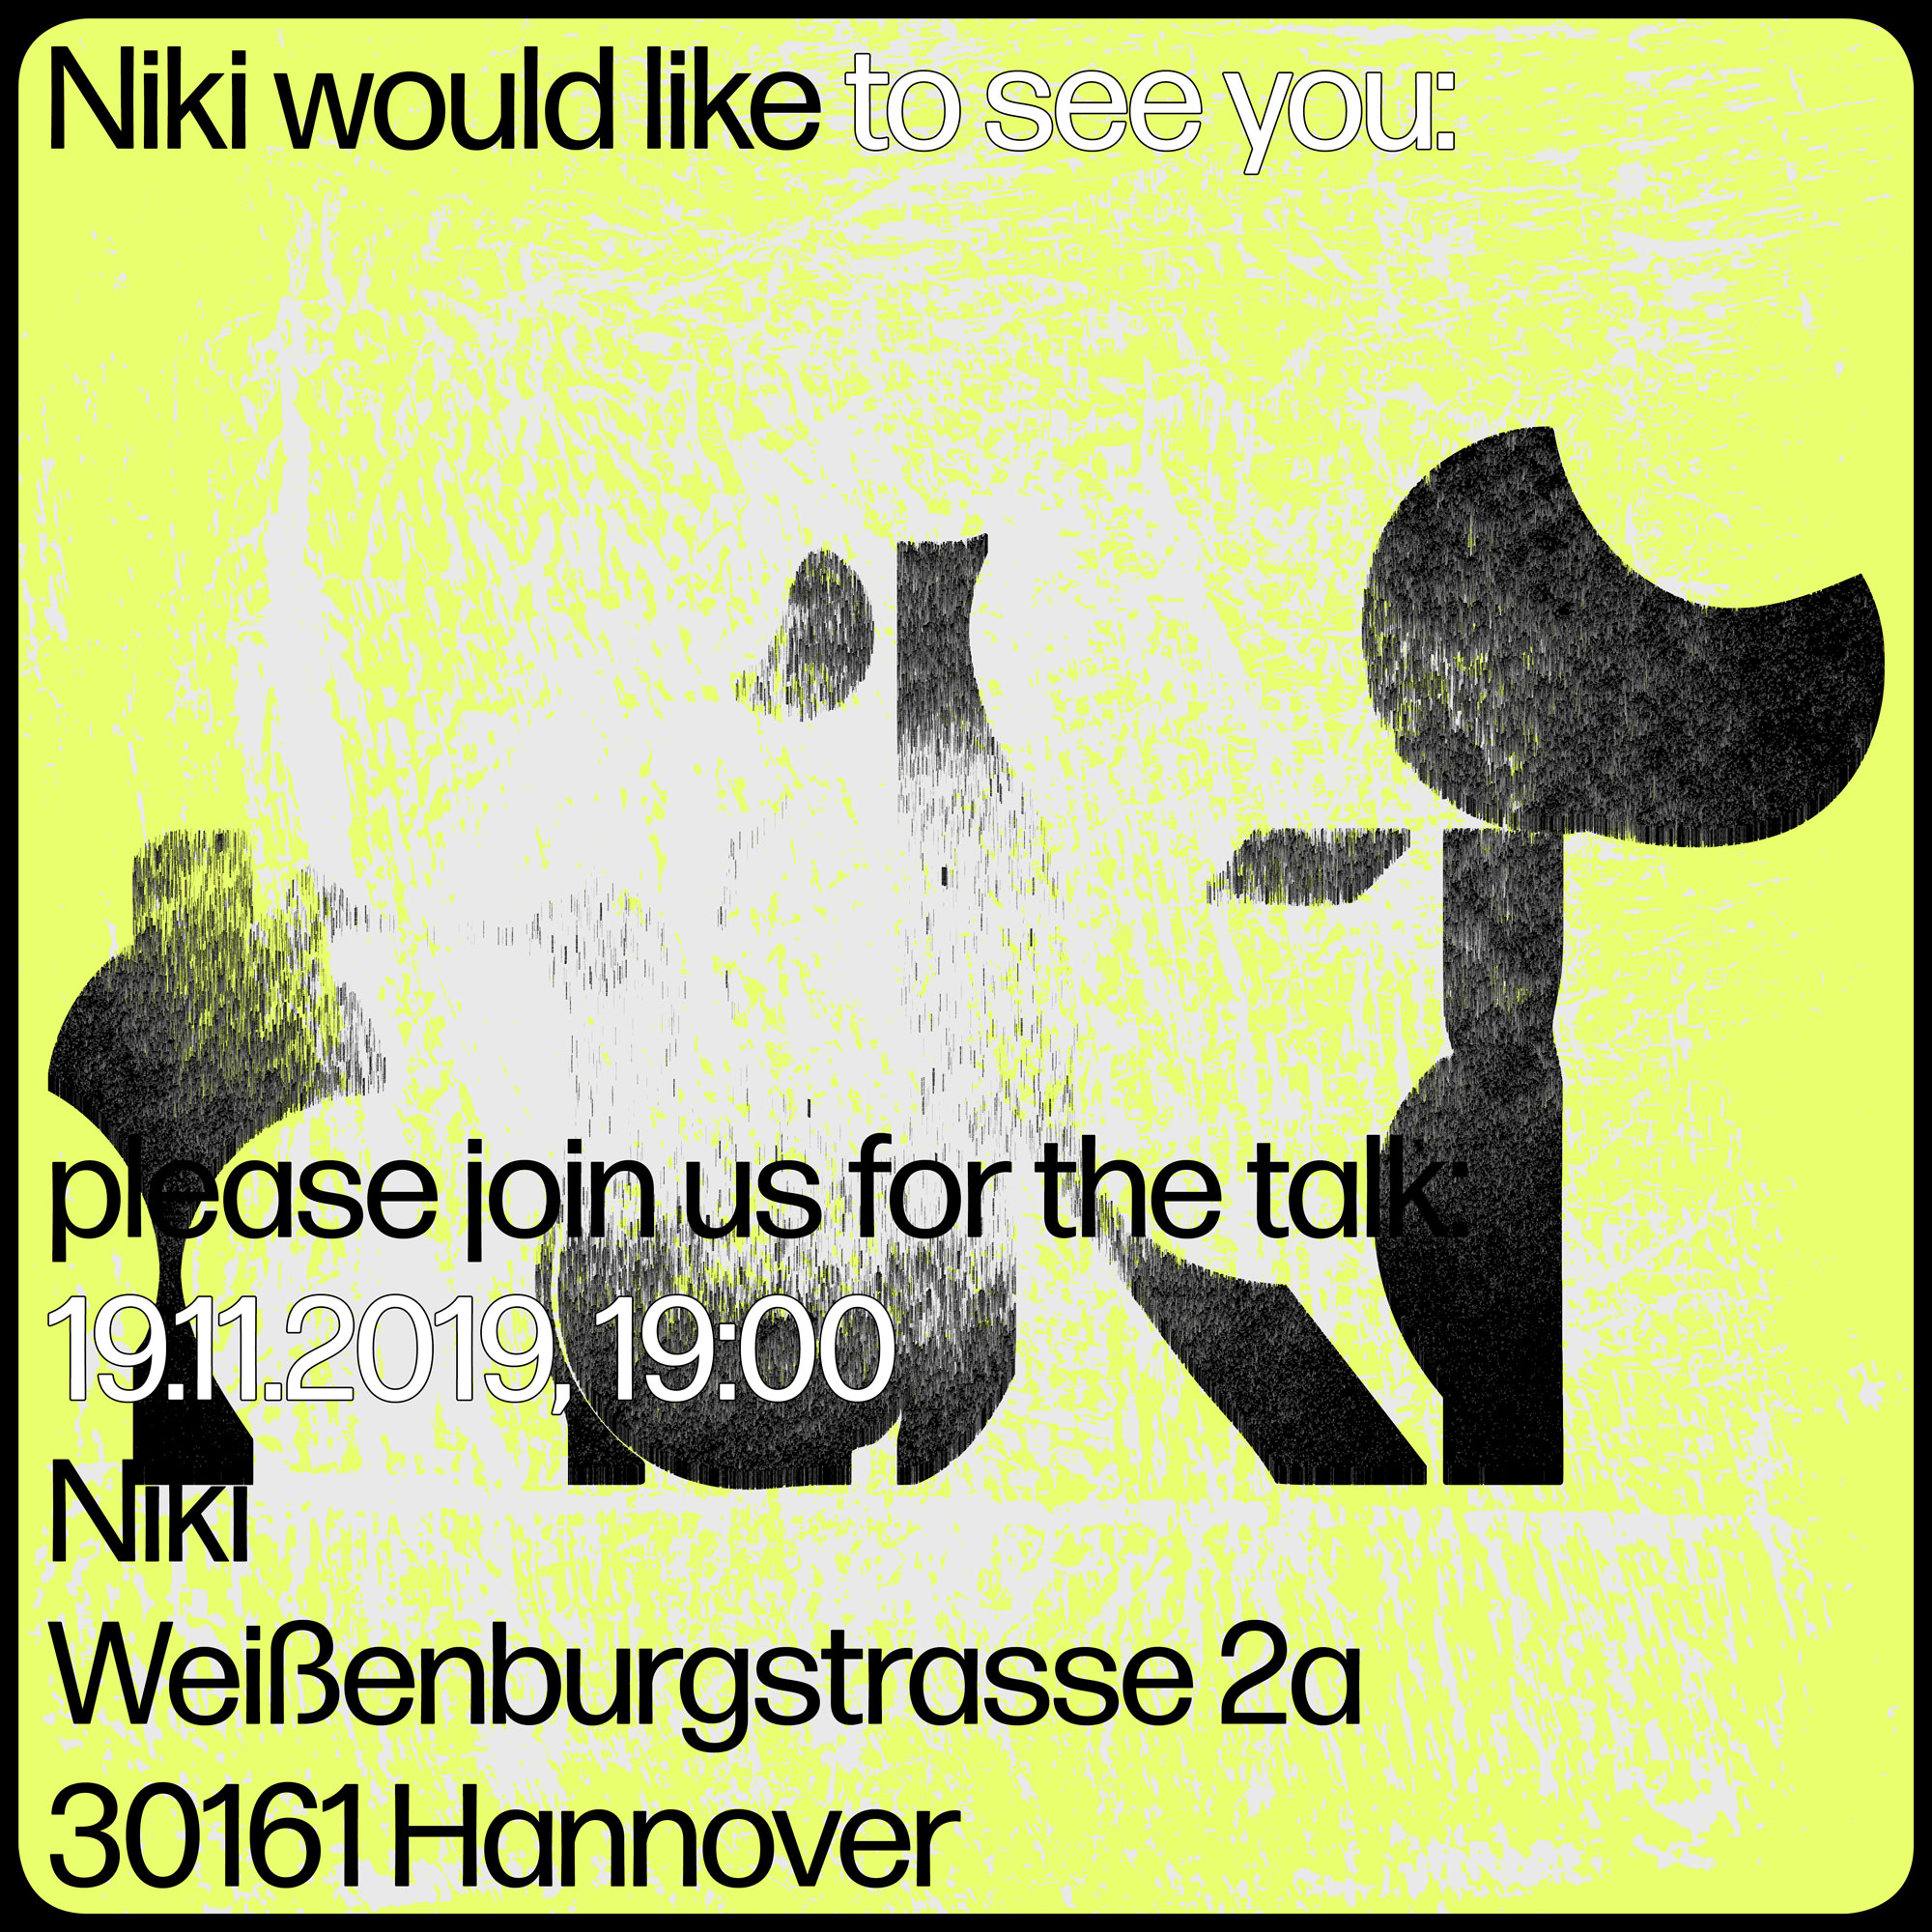 191105_niki_VioletaJaneiro_2_Tiles3_web